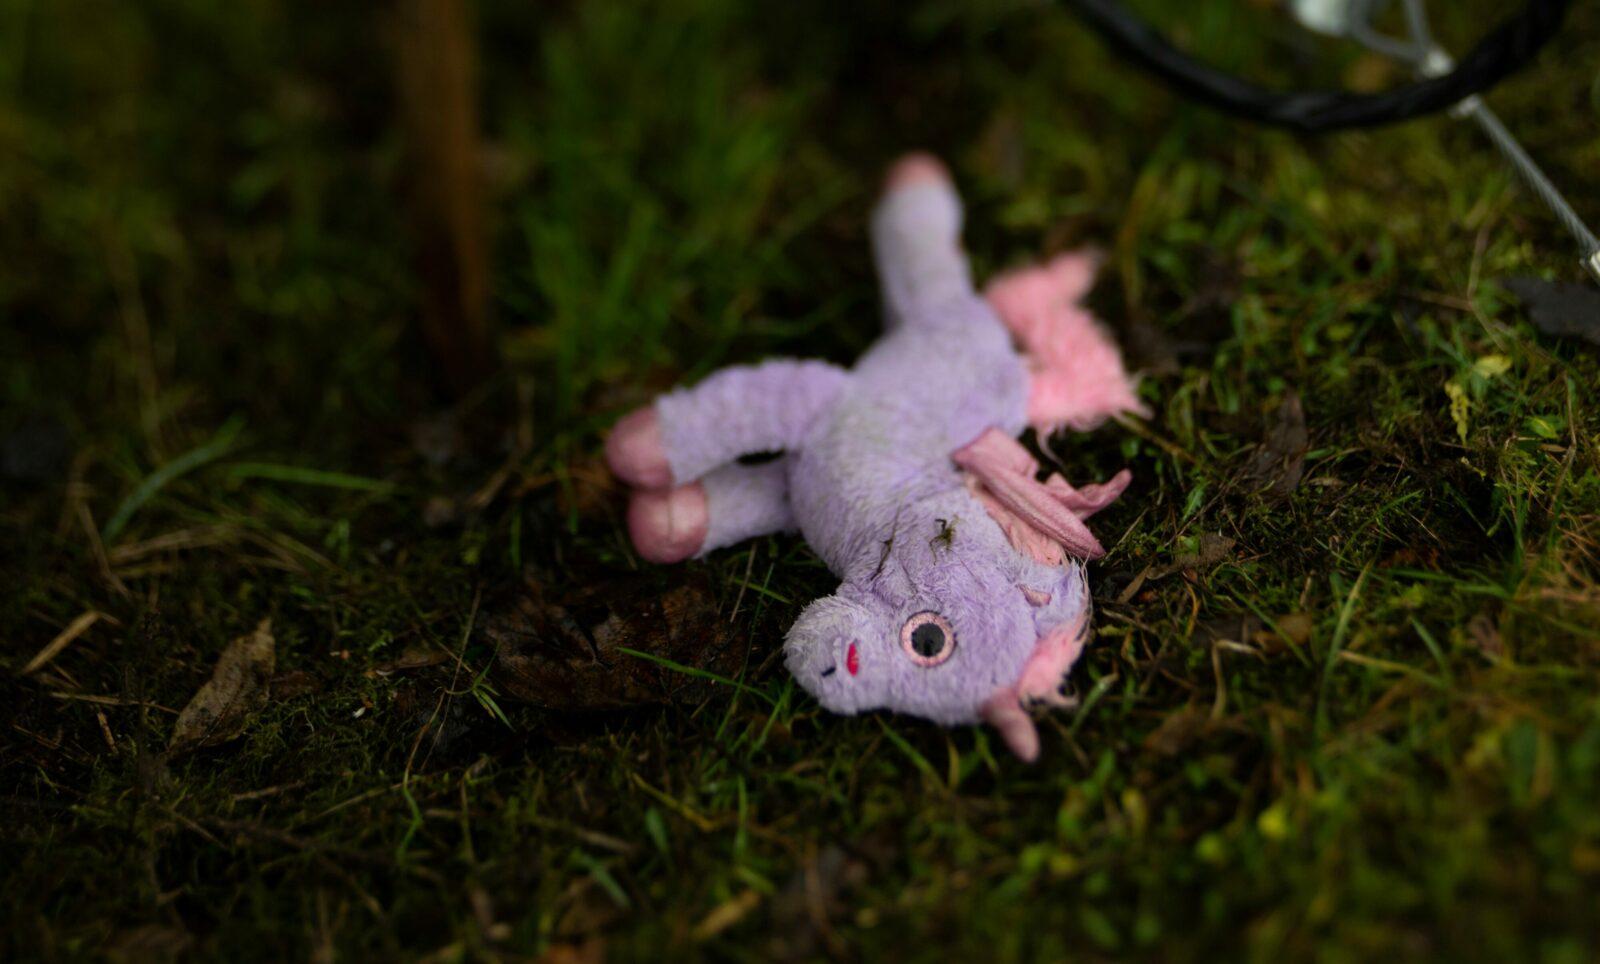 A unicorn figurine laying on the ground